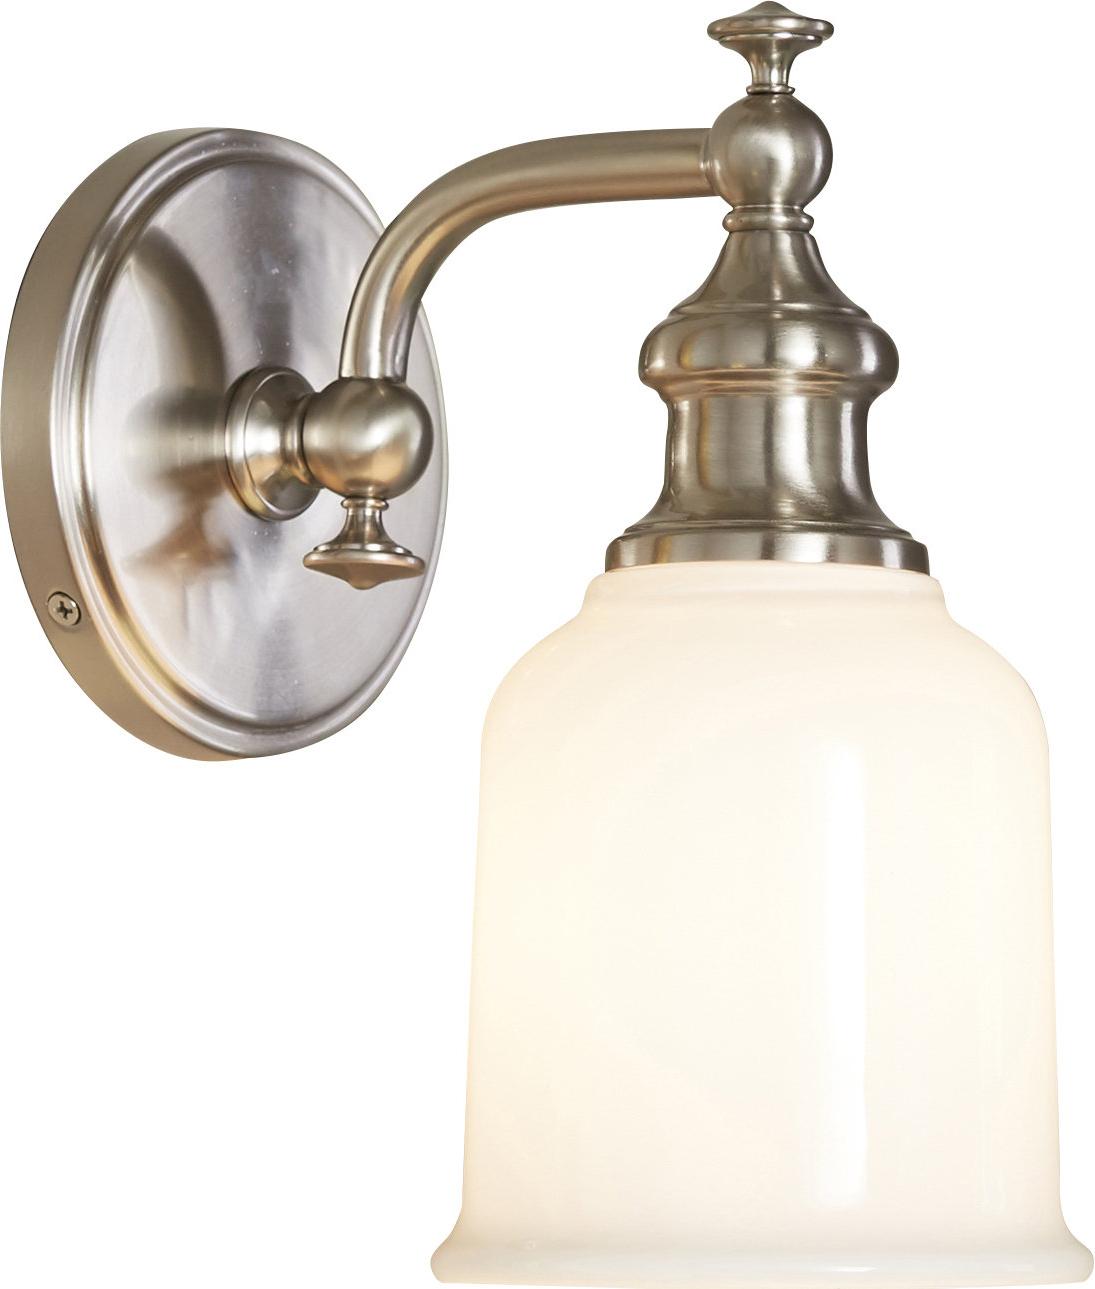 Favorite Grullon Scroll 1 Light Single Bell Pendants Pertaining To Combe 1 Light Vanity Light (View 9 of 25)